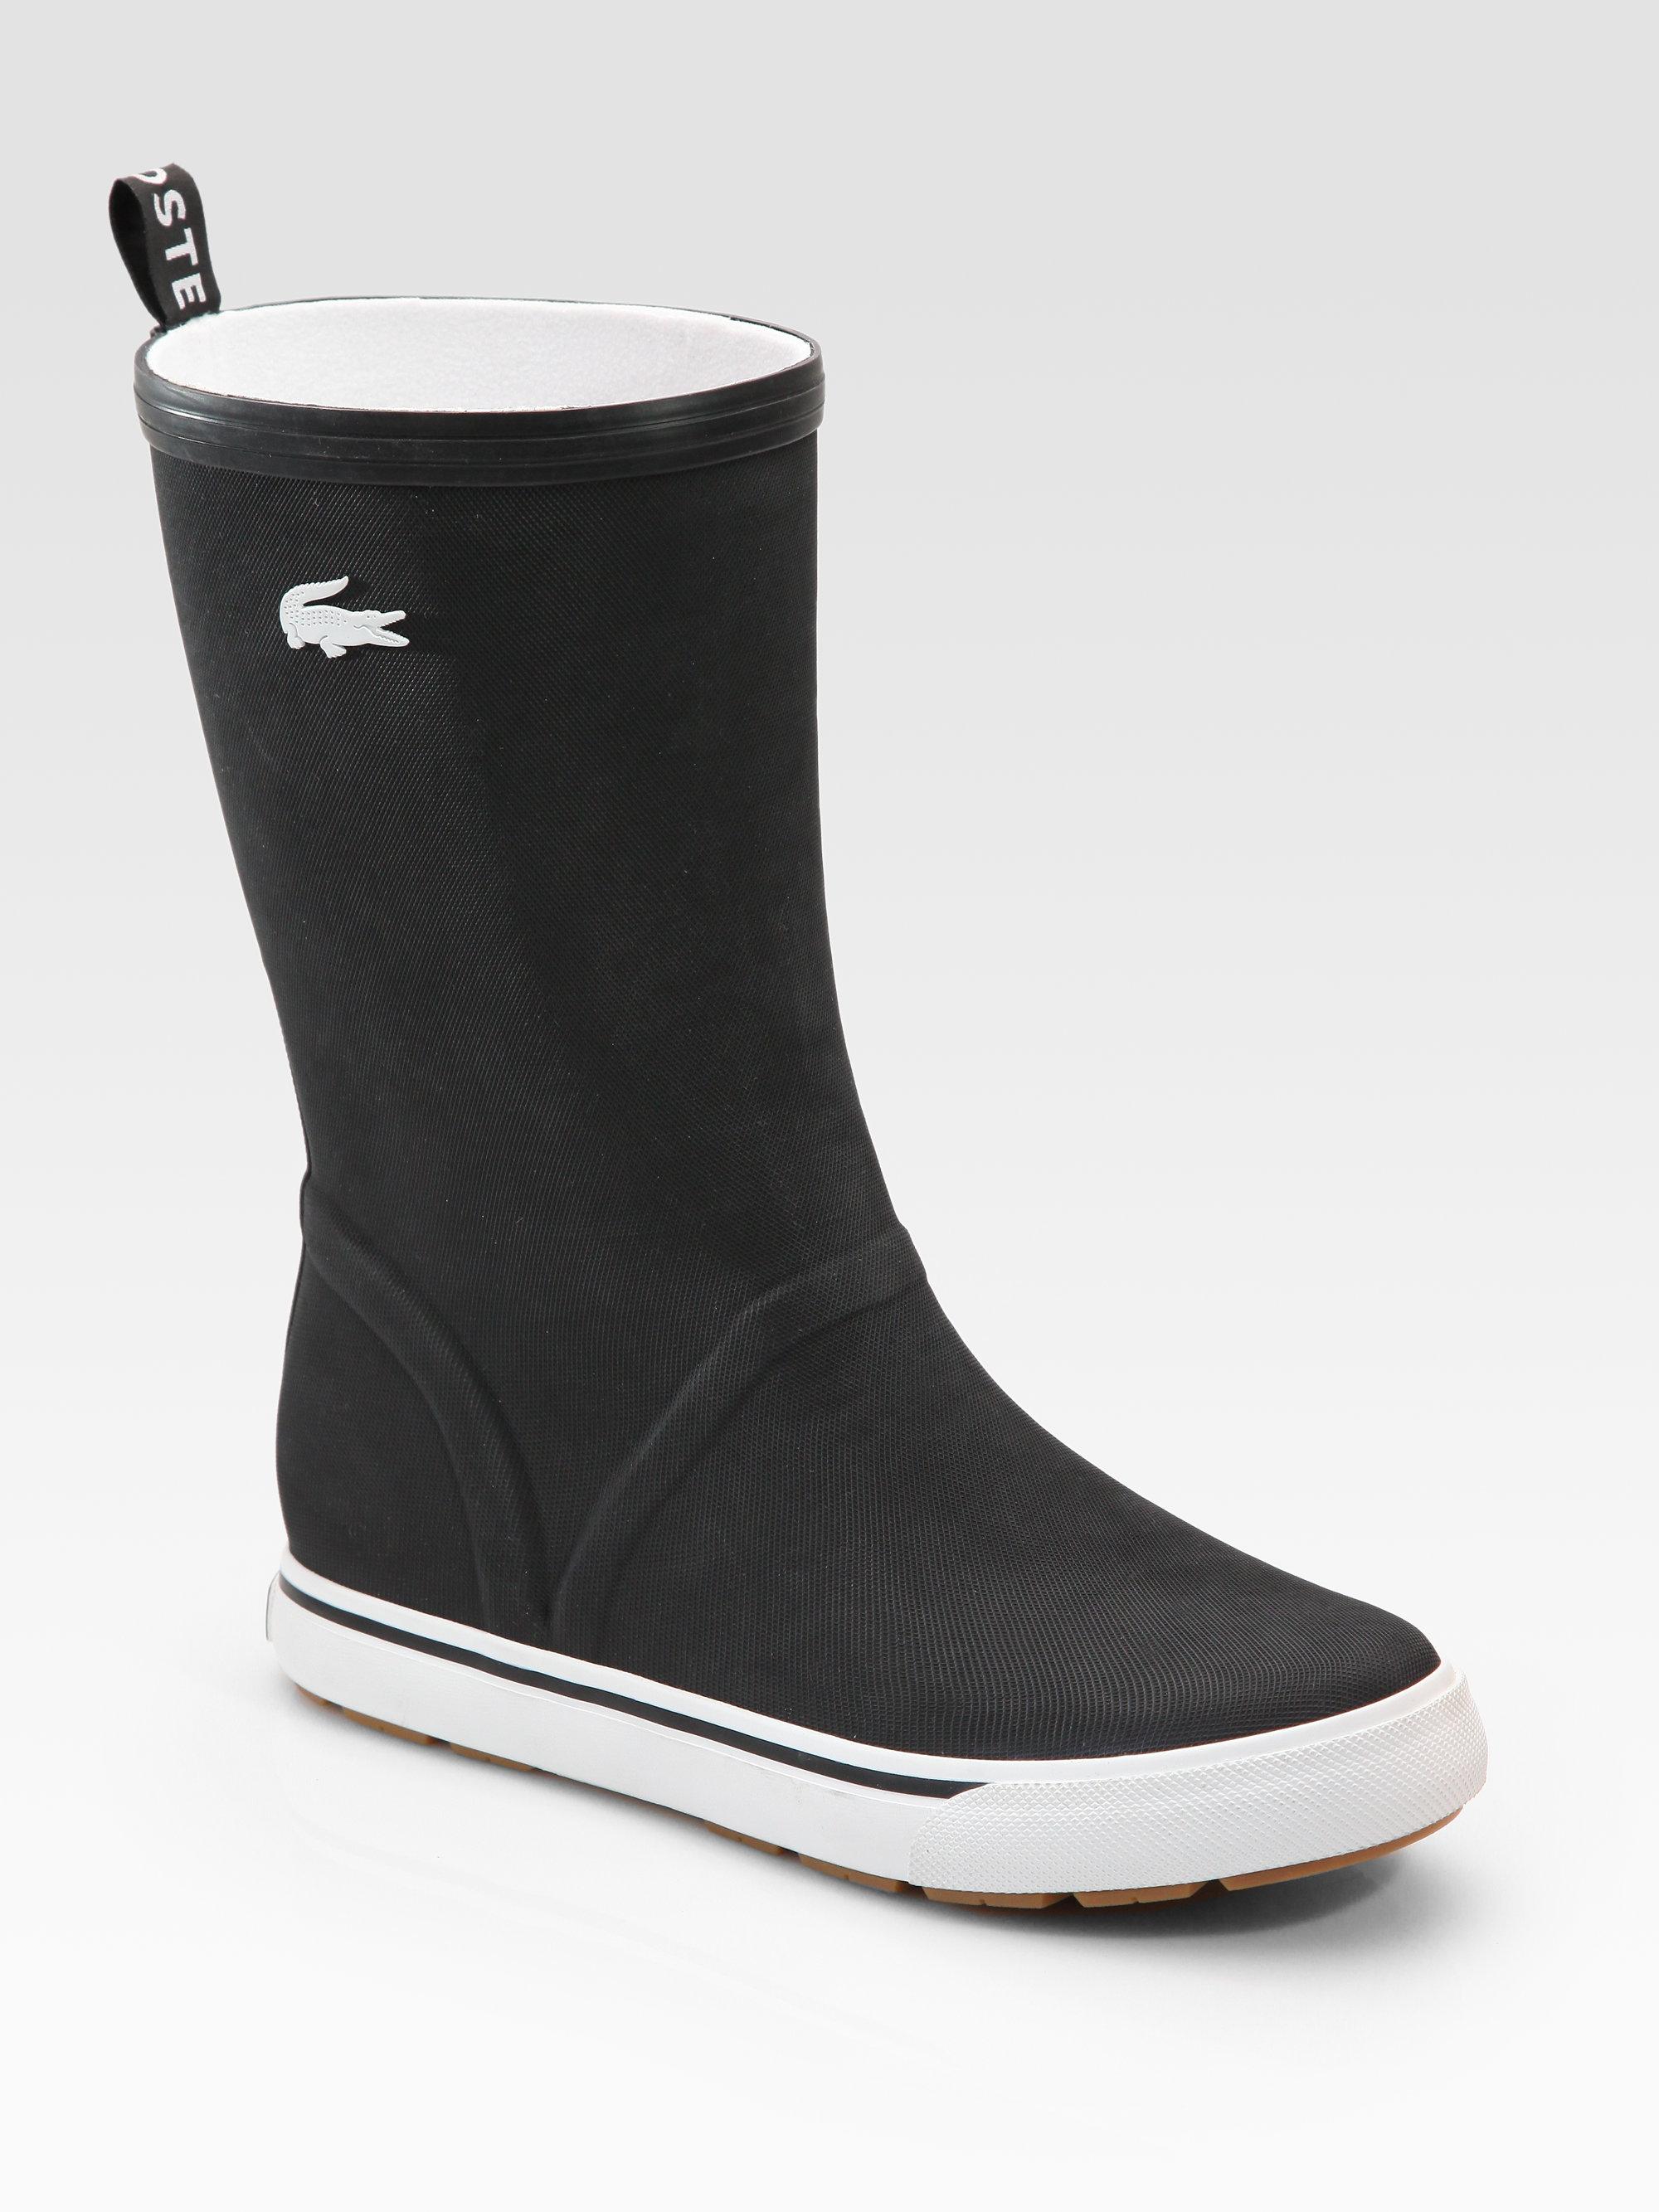 Lacoste Rain Boots in Black for Men | Lyst